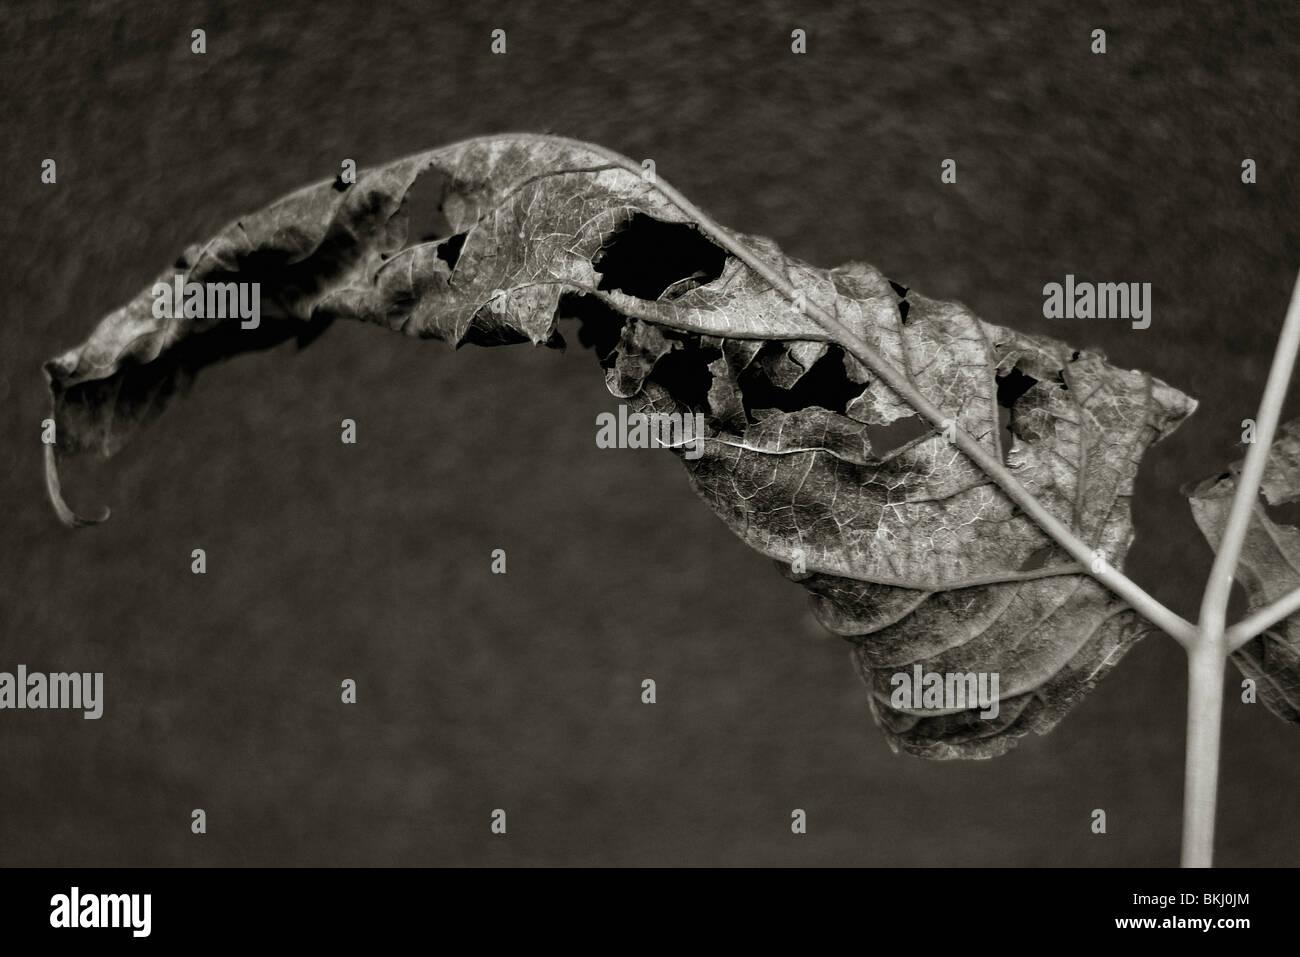 Dying leaf. - Stock Image